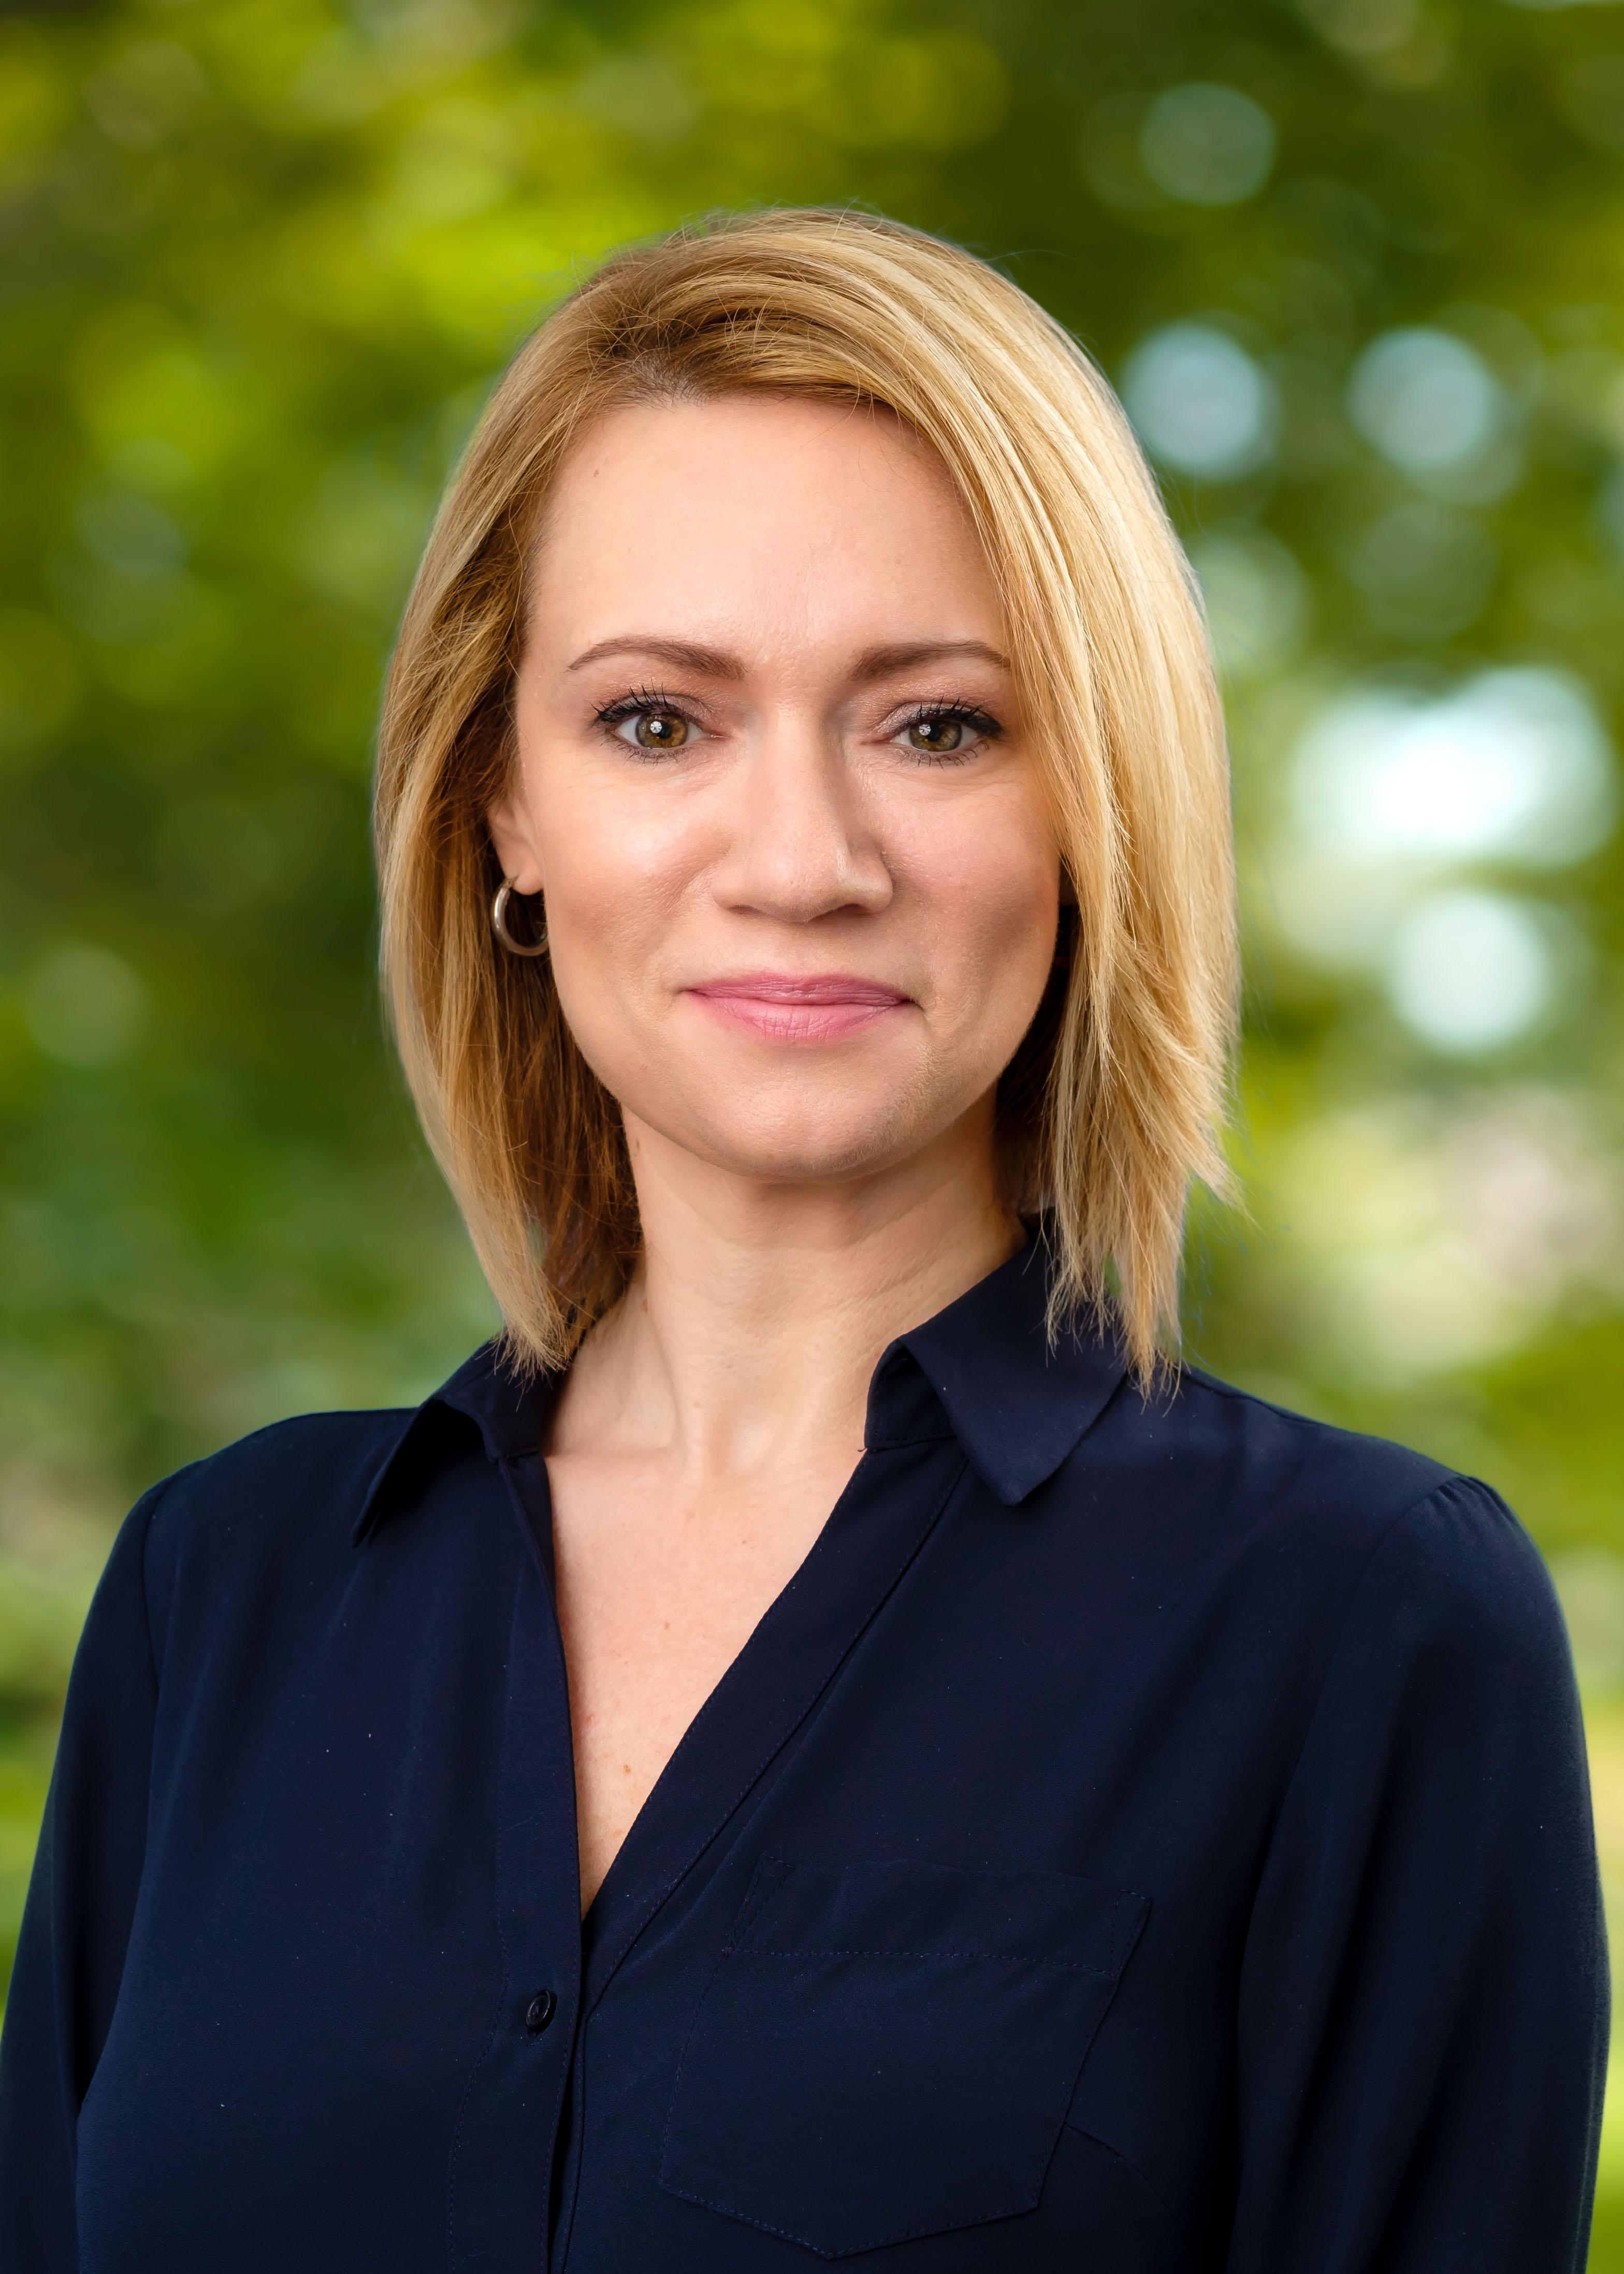 Heather Brennan